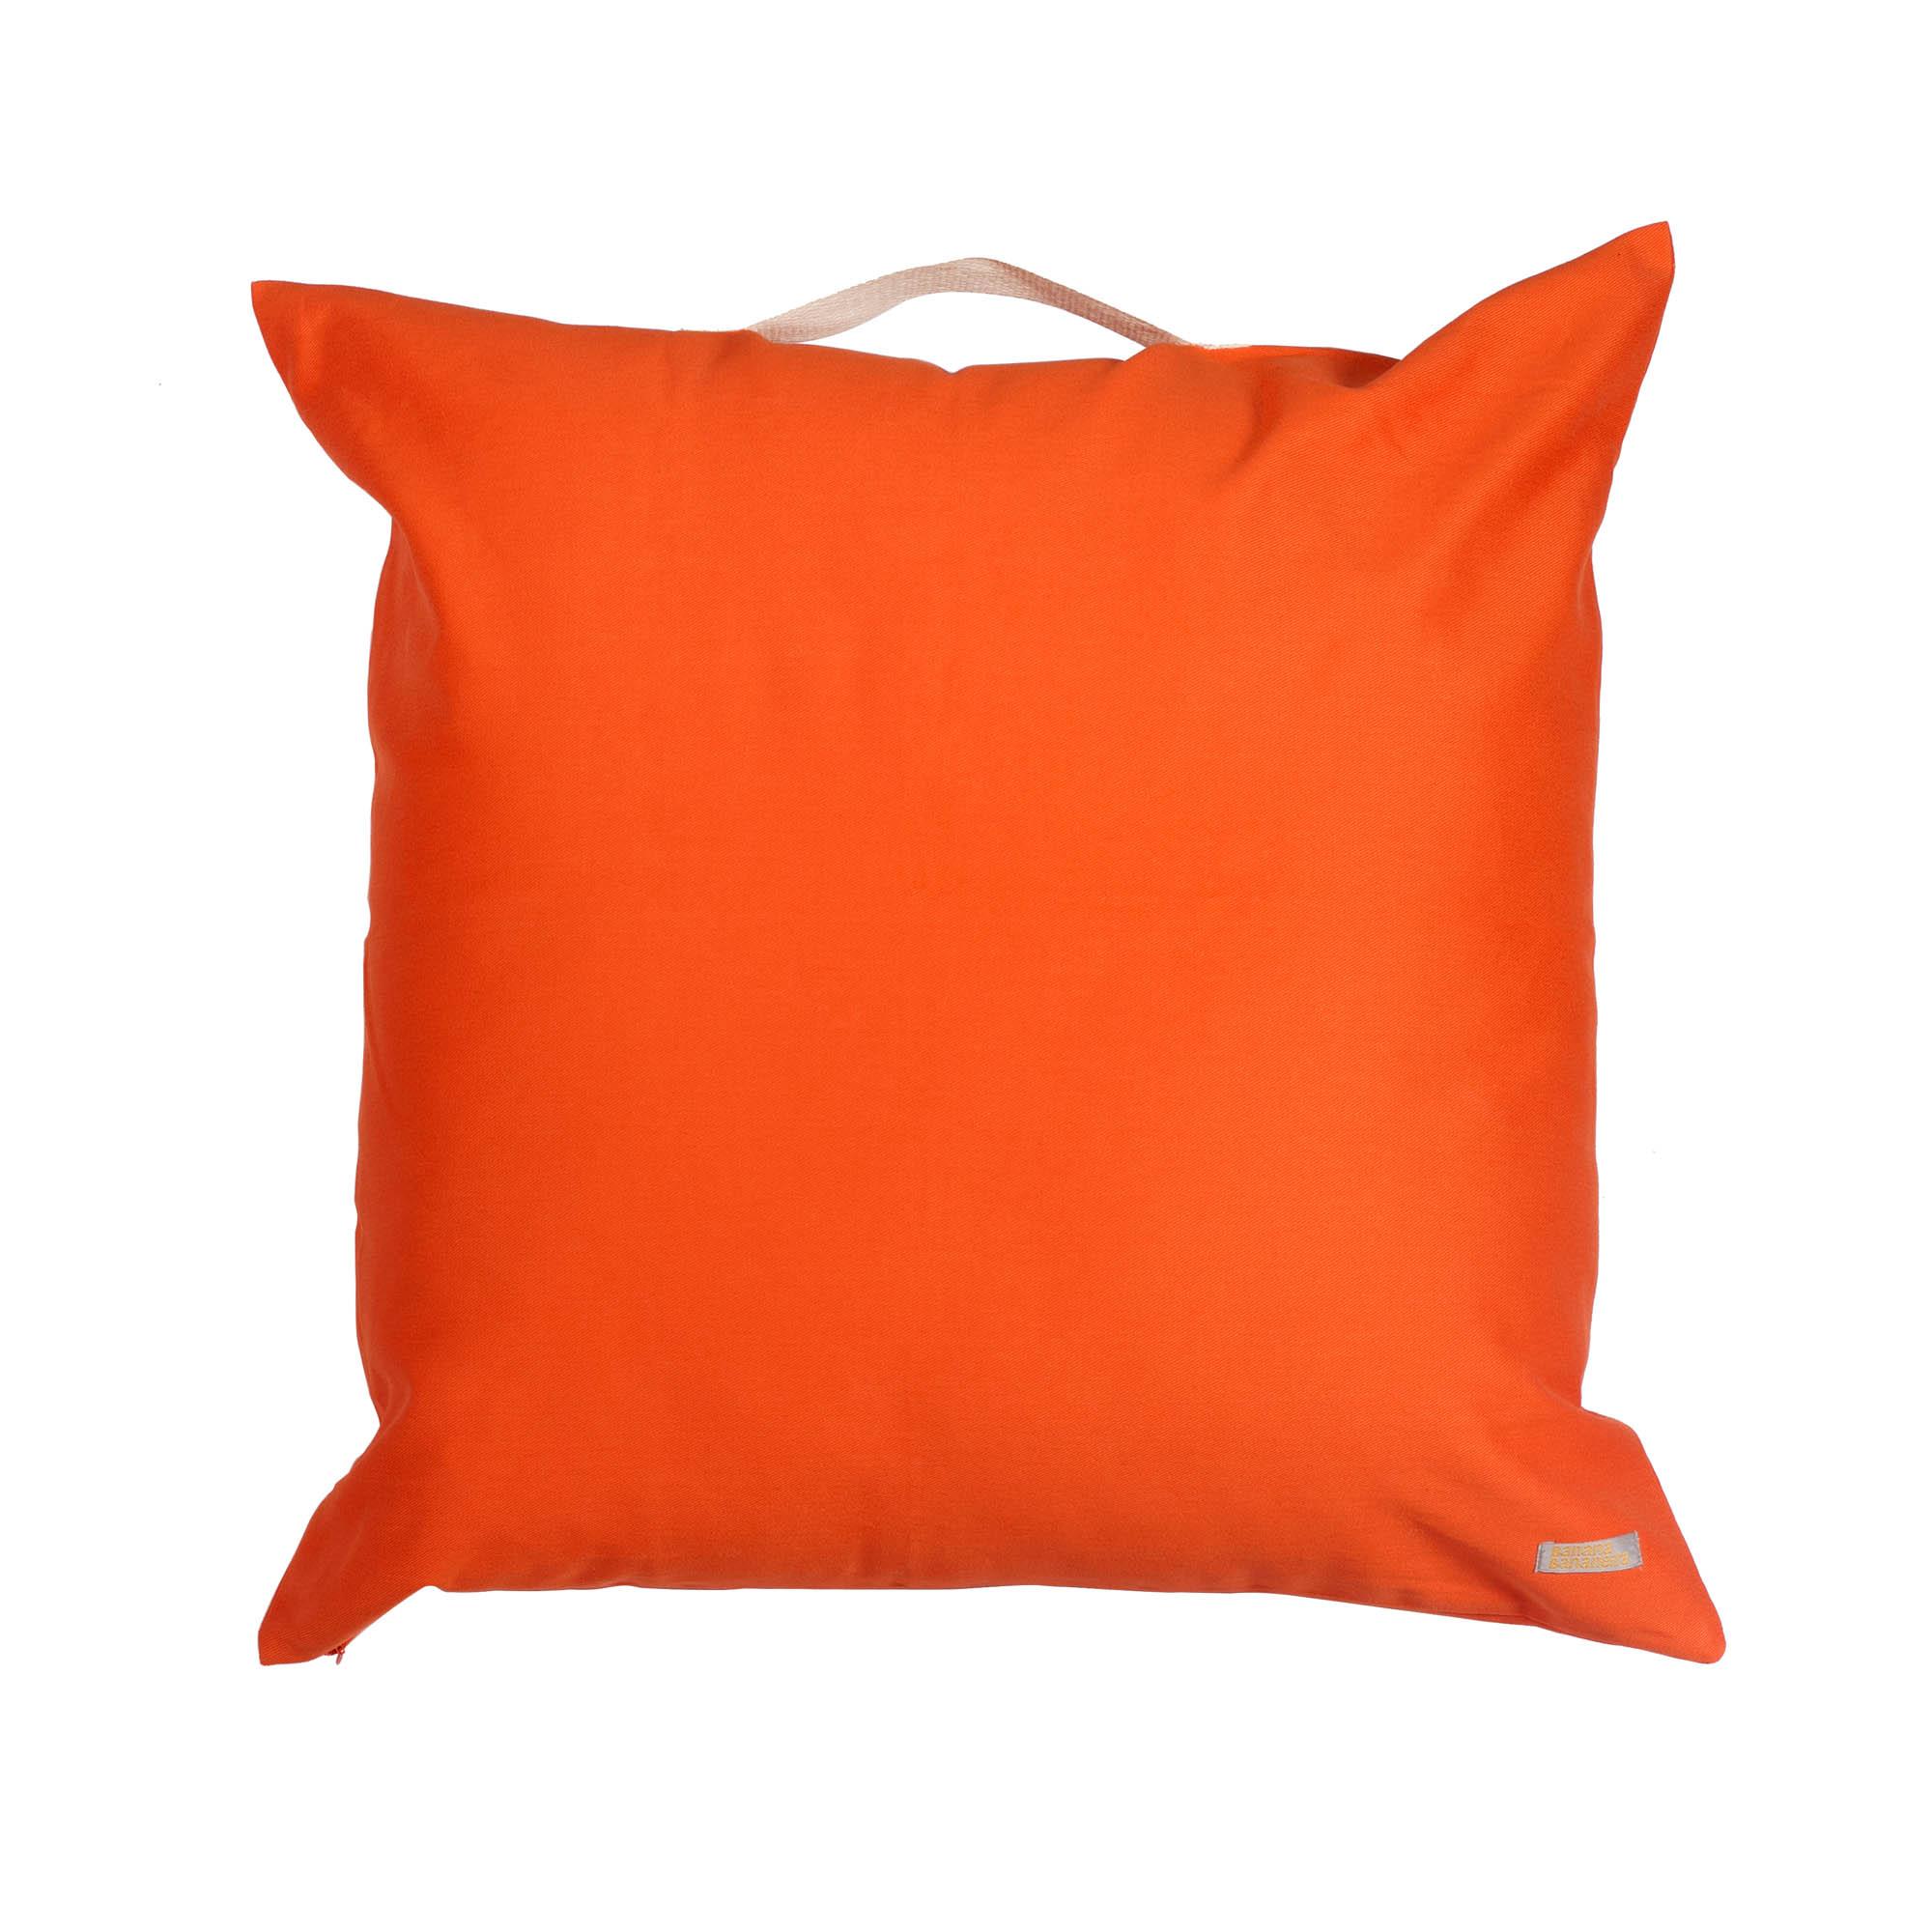 Almofadão pufe tangerina